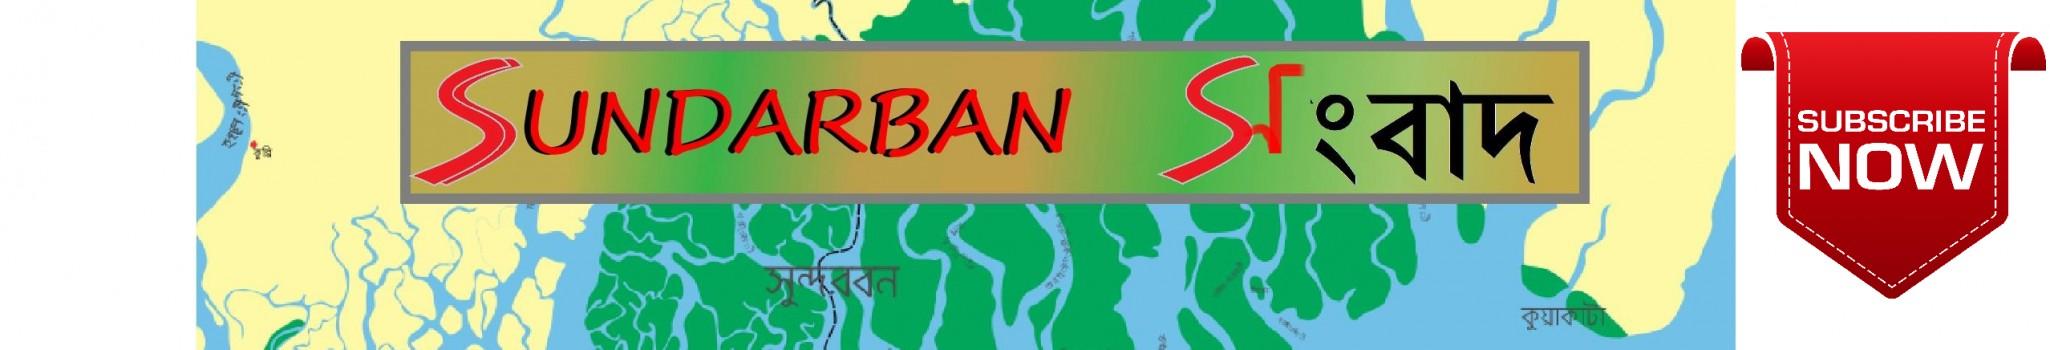 Sundarban Sambad সুন্দরবন সংবাদ